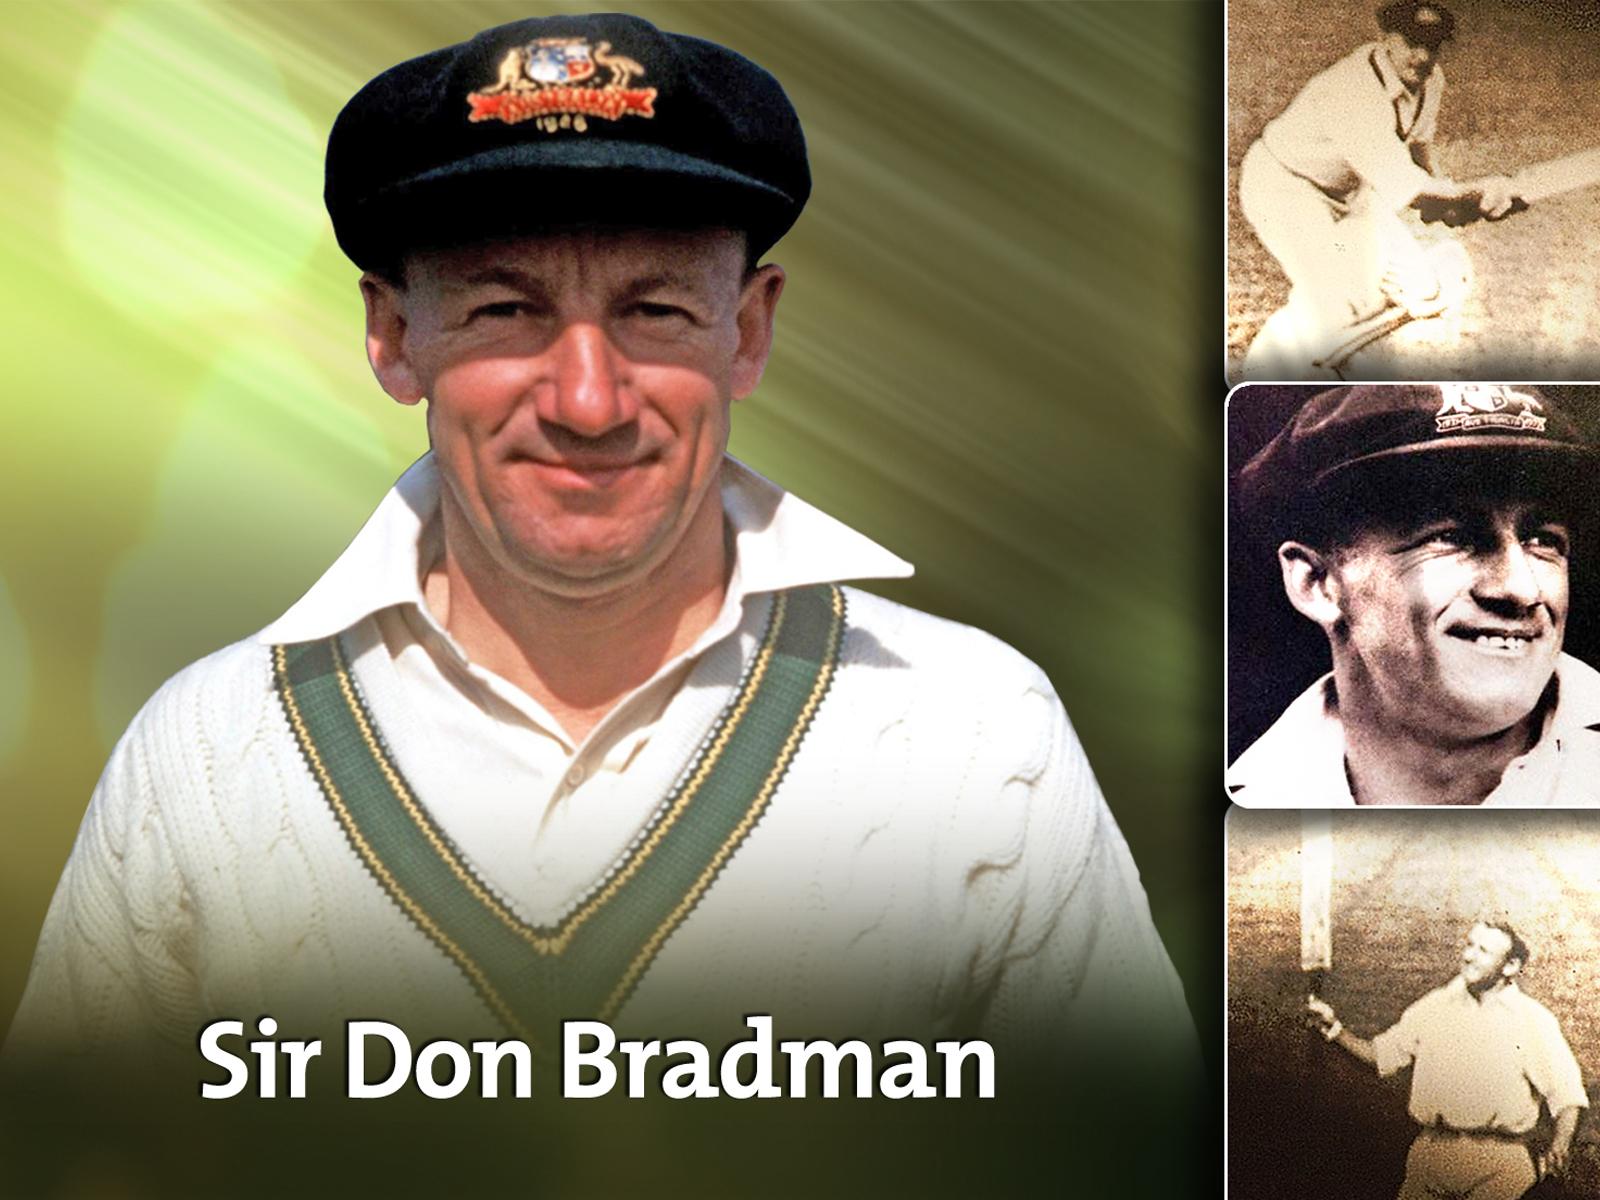 Sir Don Bradman